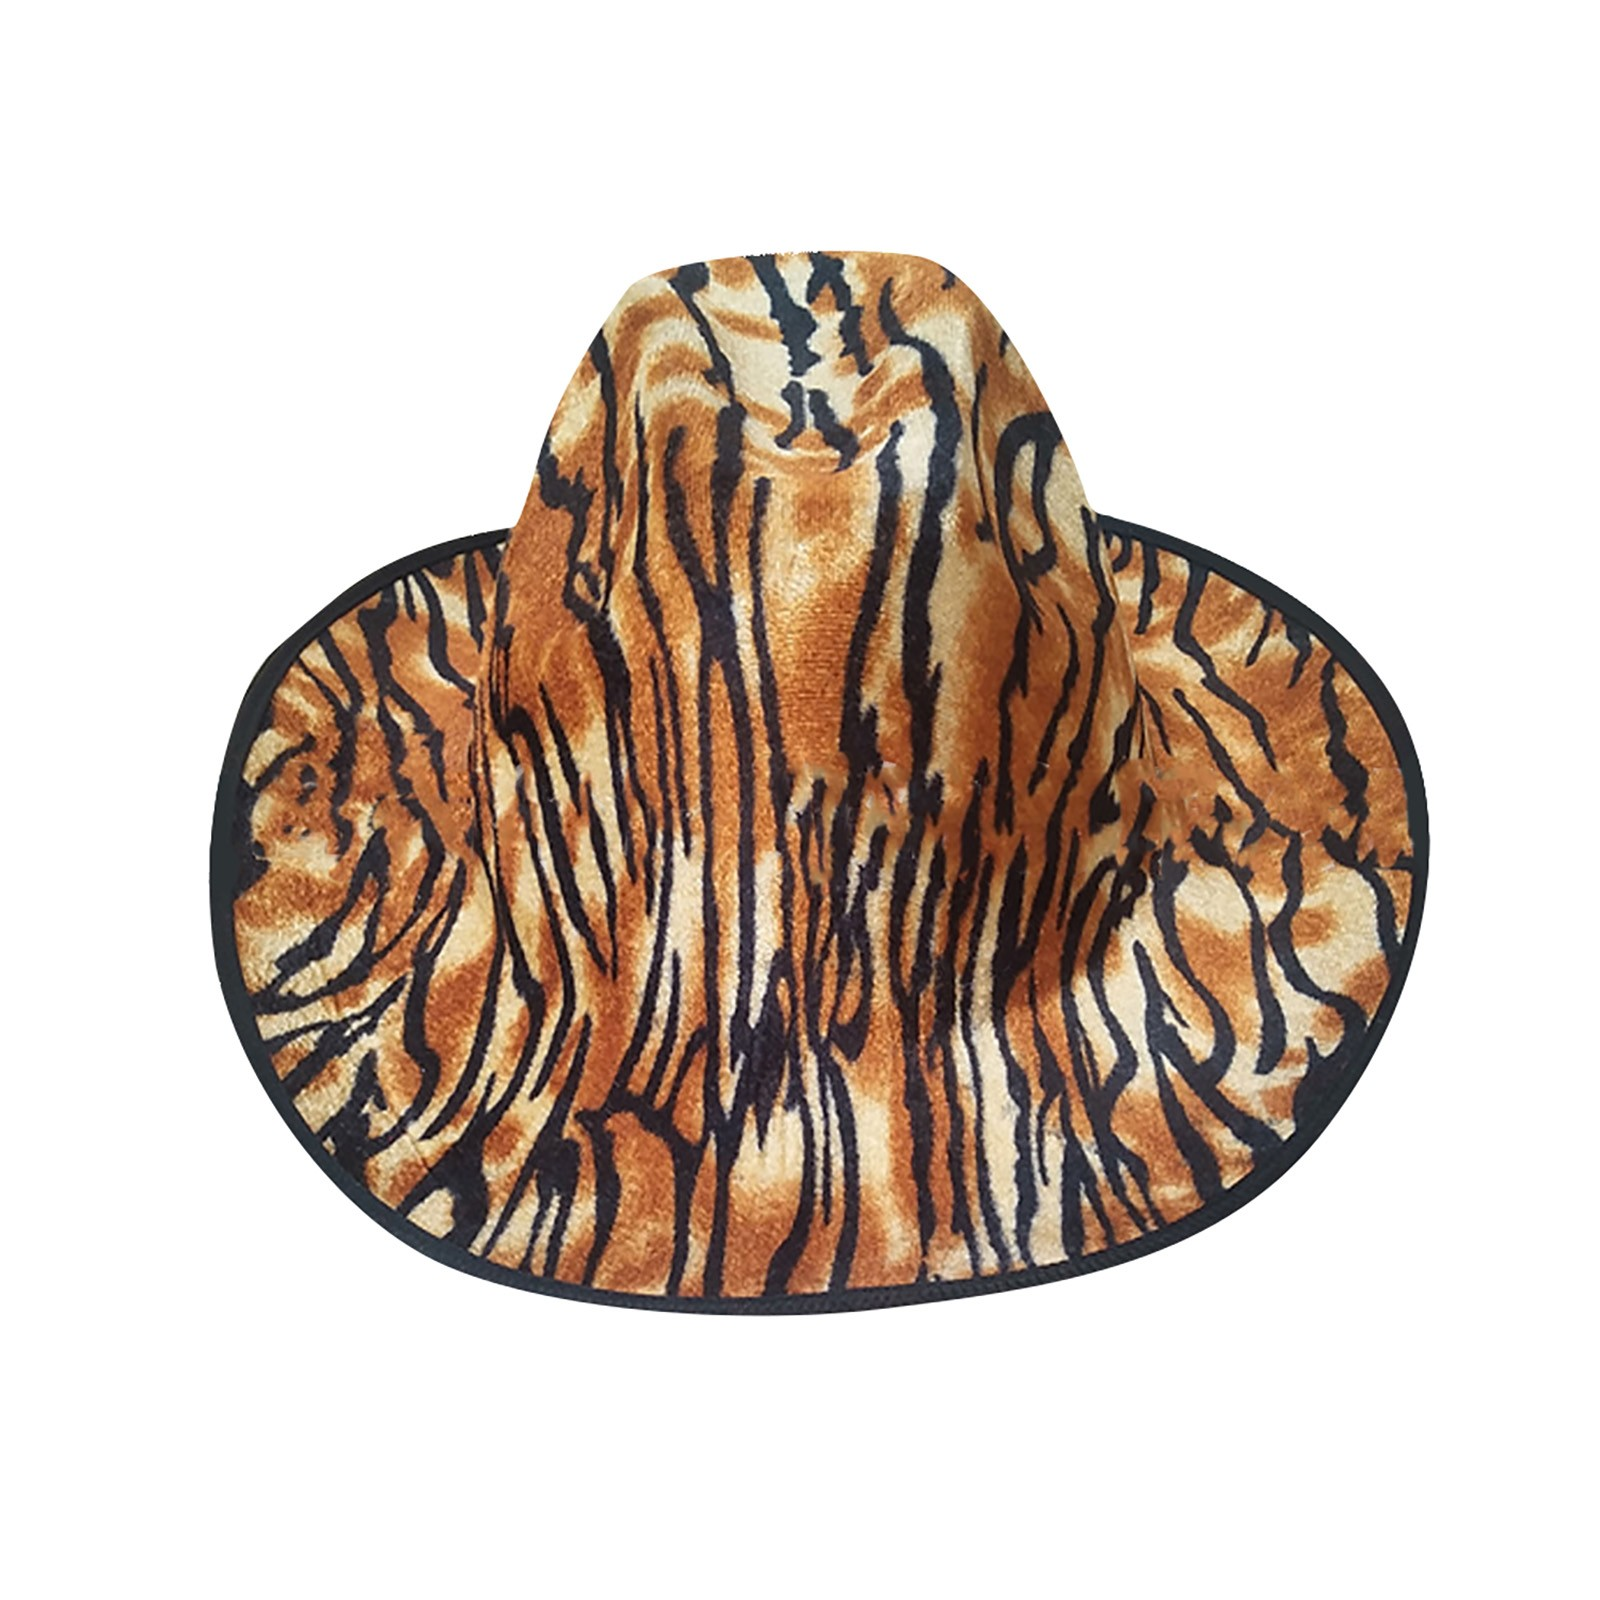 New Leopard Pattern Bucket Hats Bow Fisherman's Hat Women's Summer Basin Hat Fashion Versatile SunHat Hip Hop Fishman Hat Travel